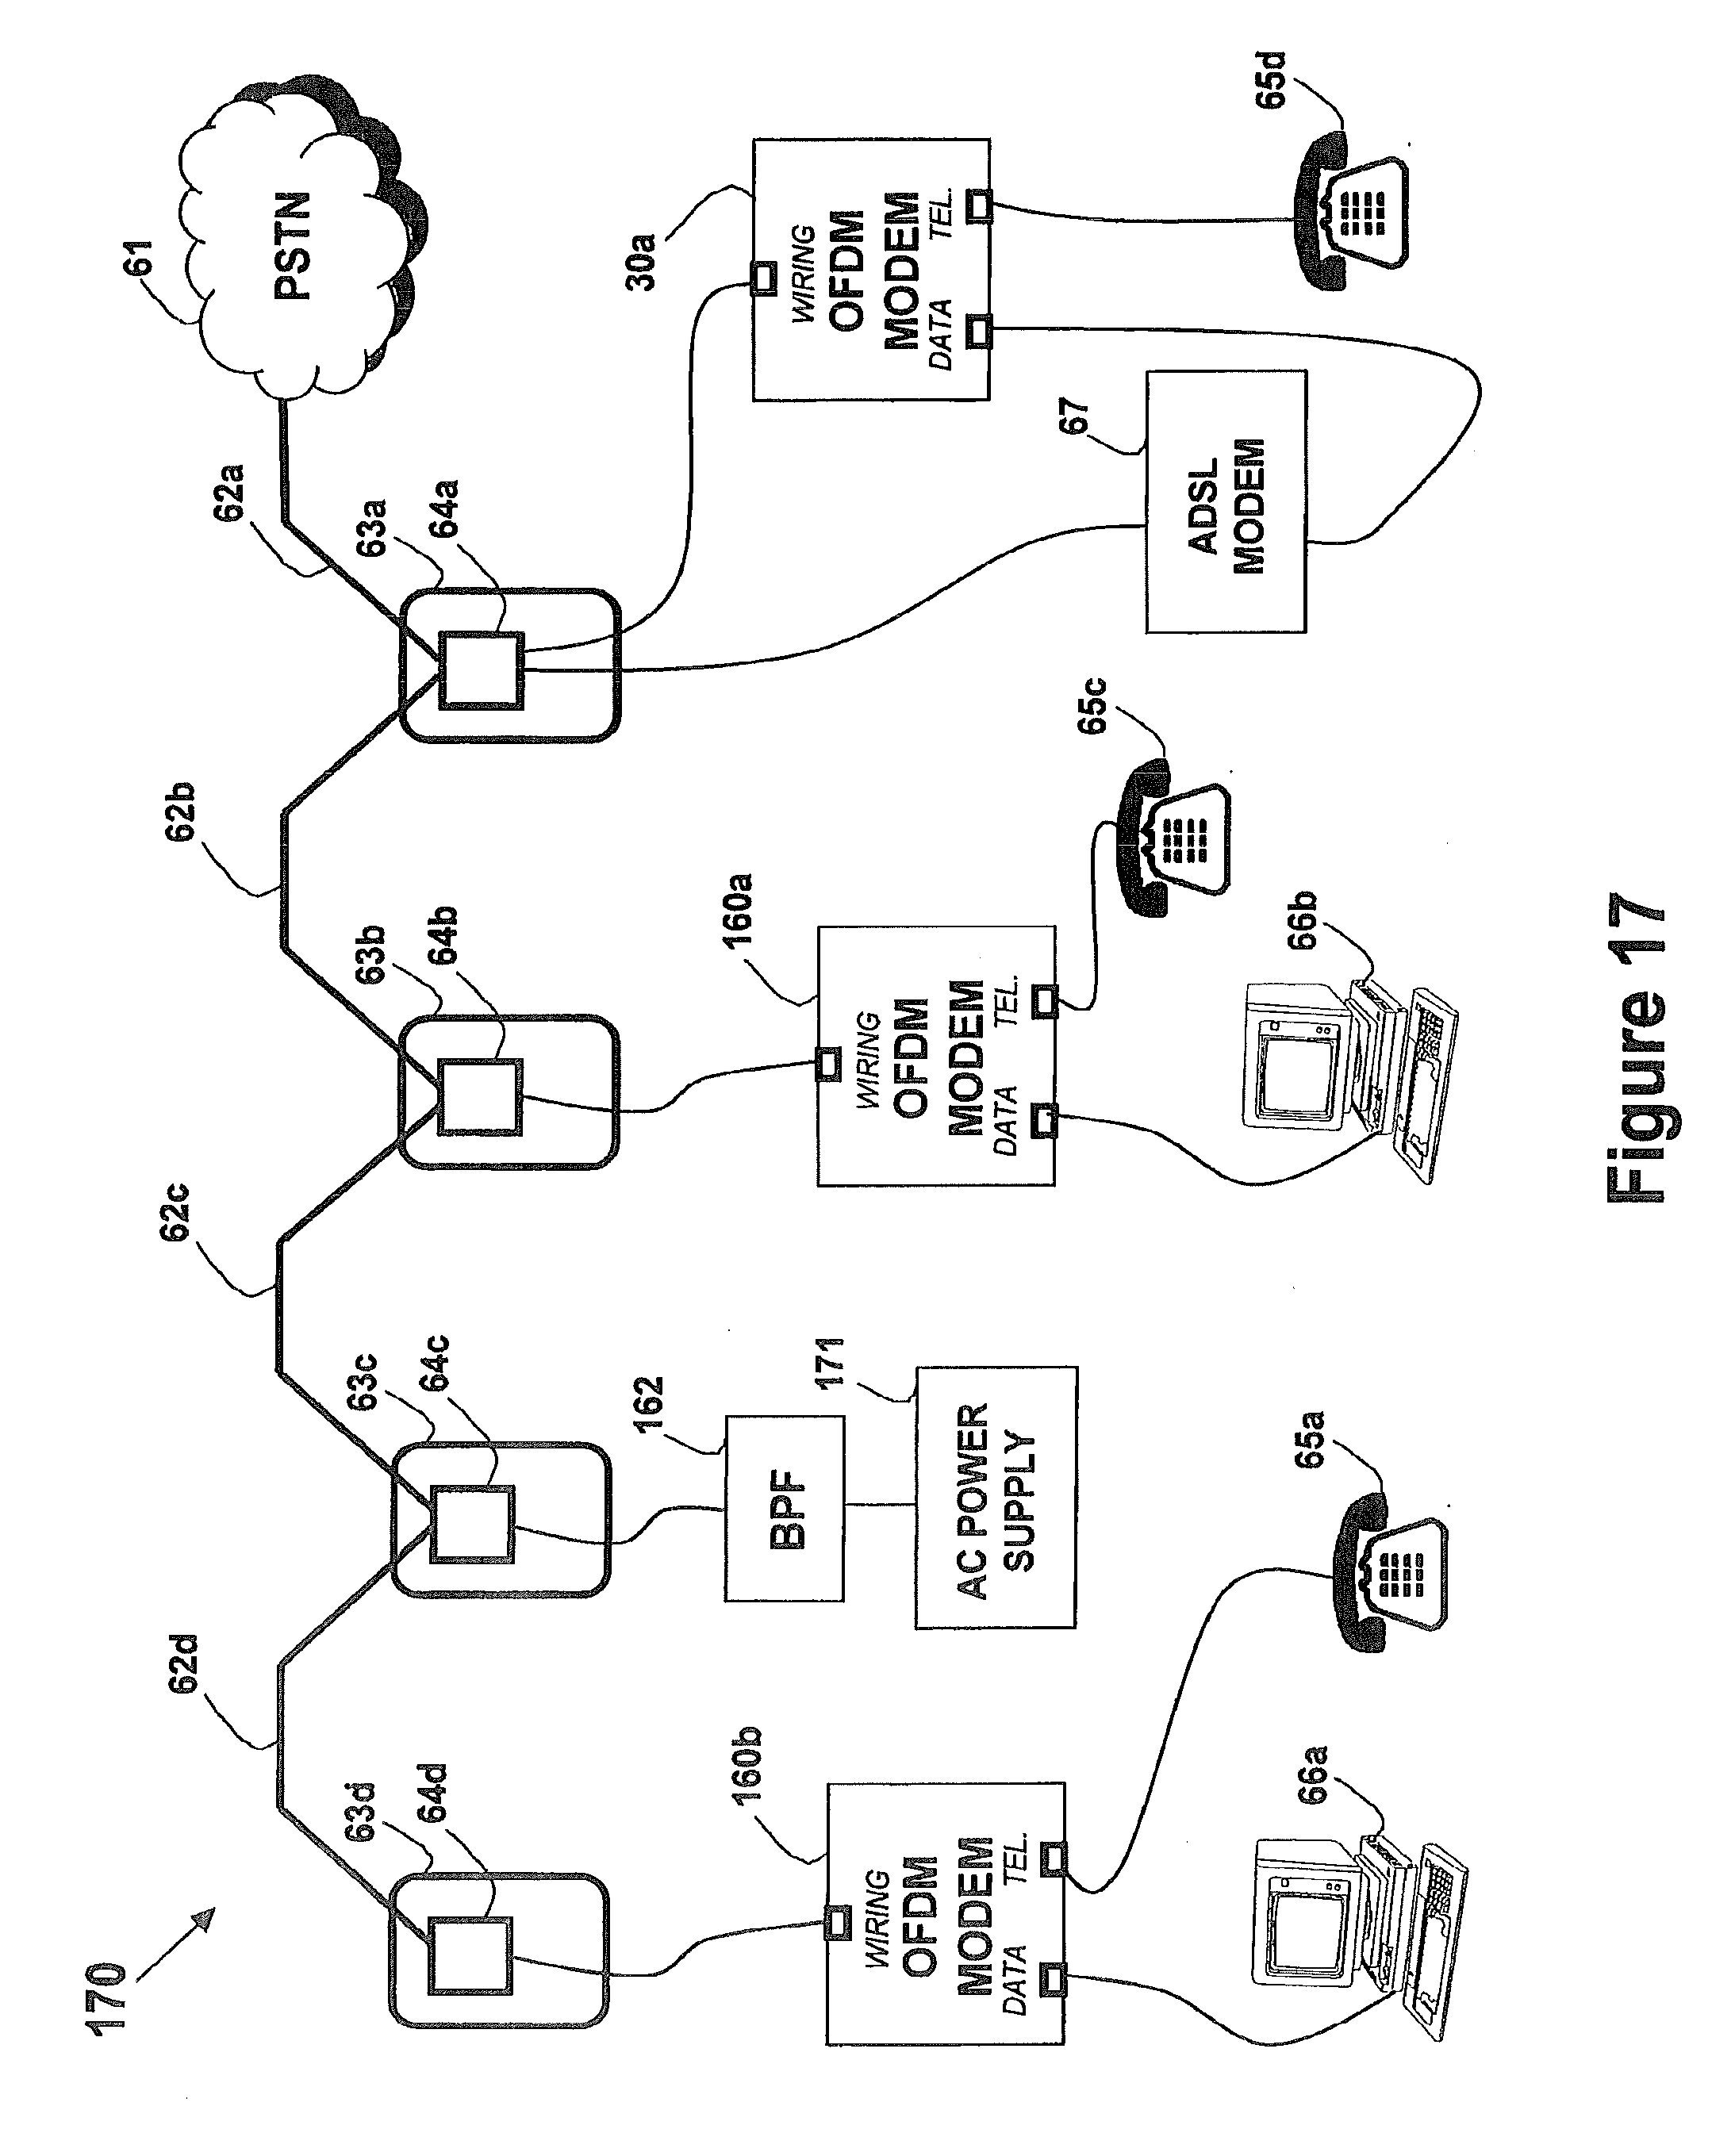 patente us20130051404